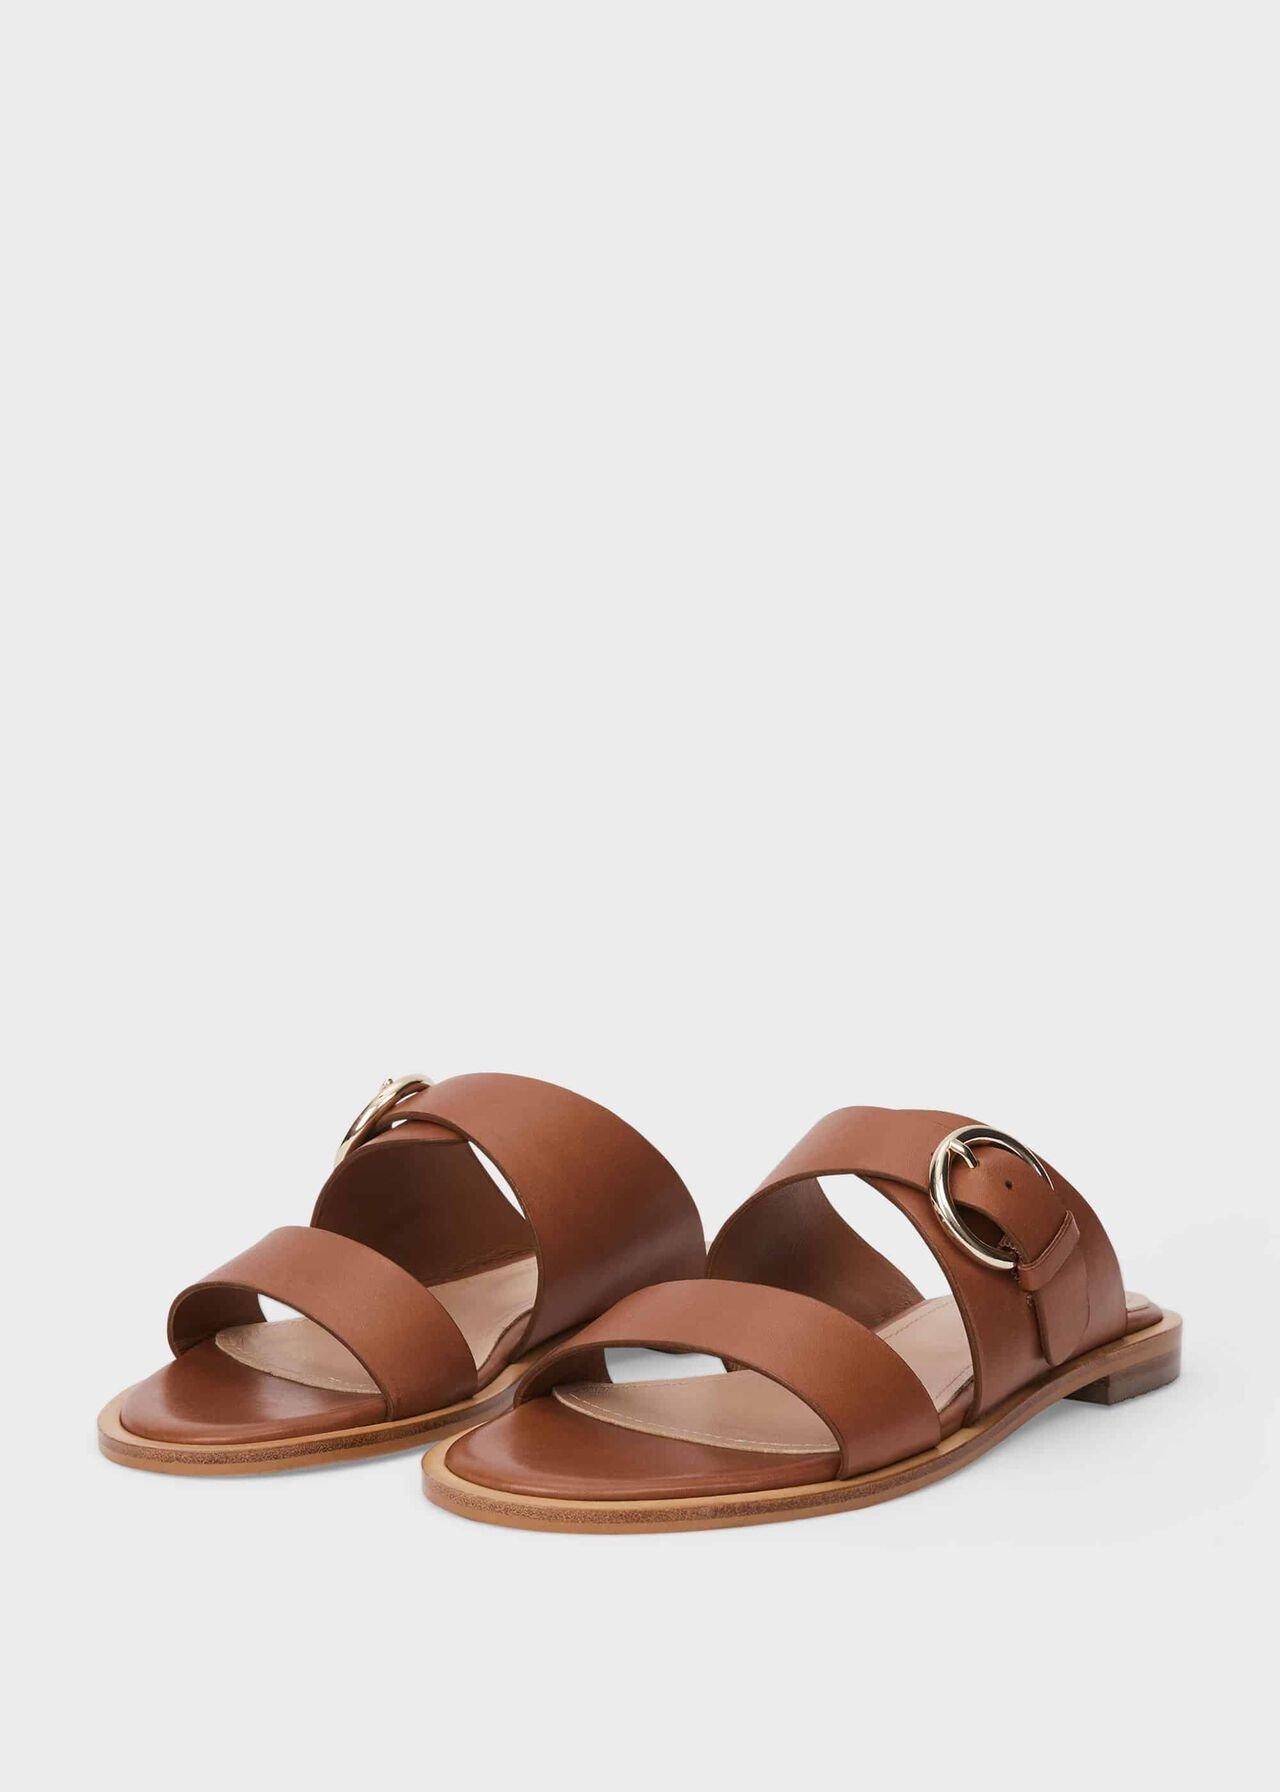 Sienna Leather Sandals , Tan, hi-res